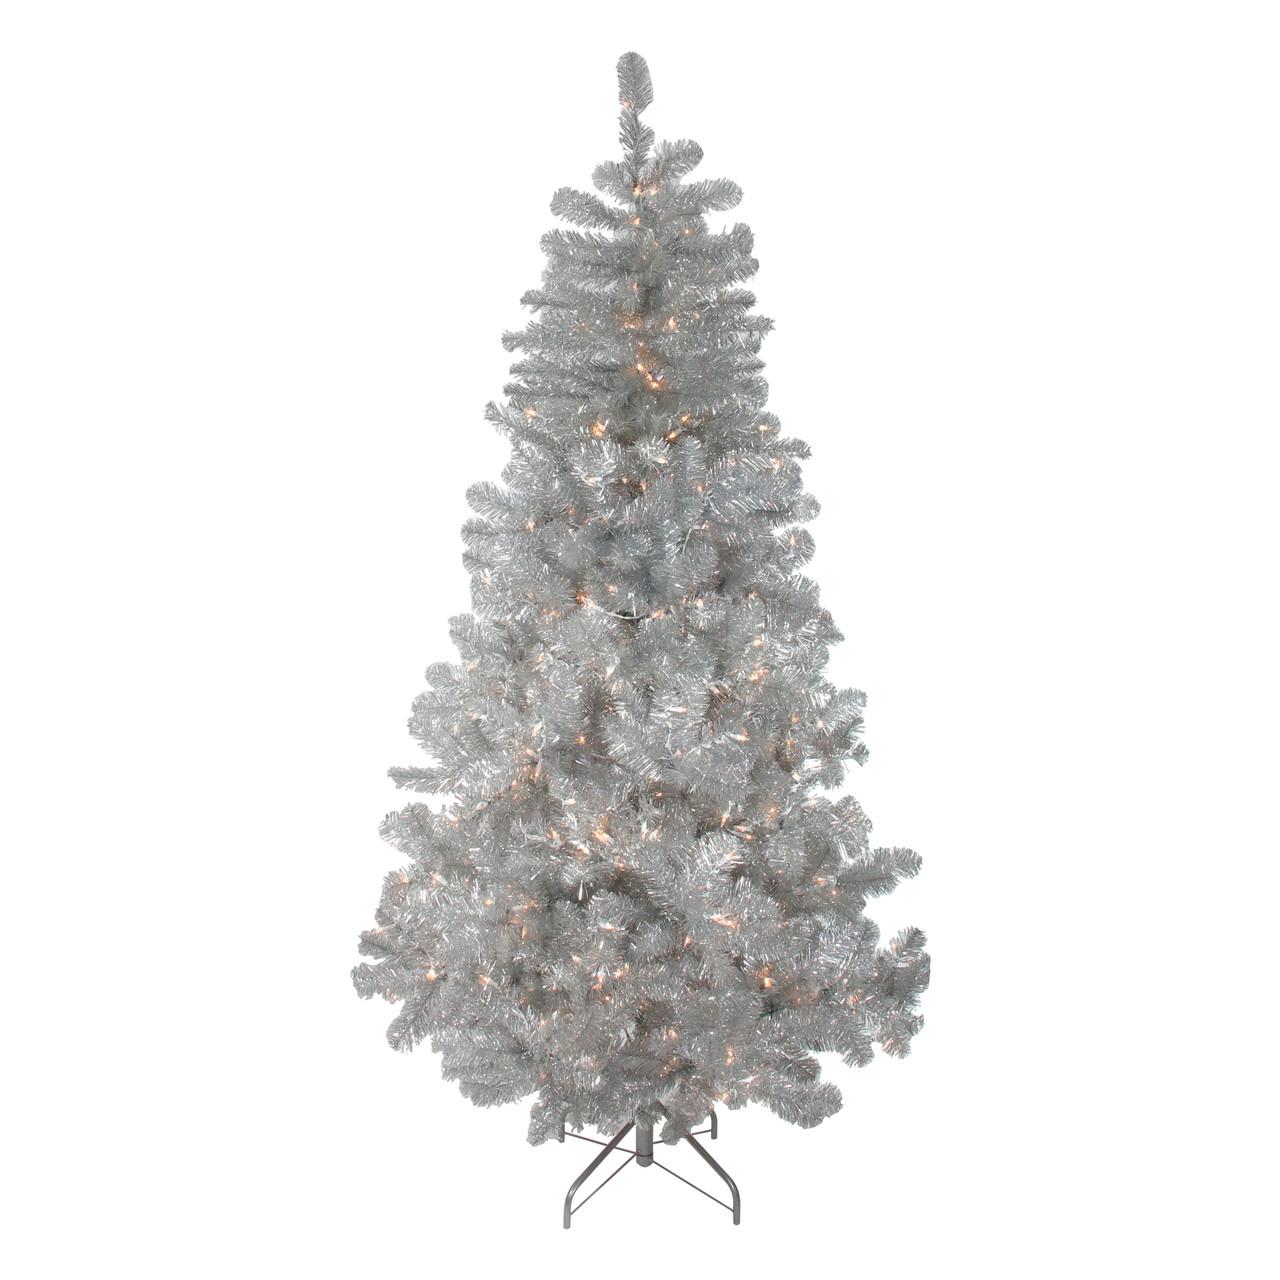 7.5' Pre-Lit Silver Metallic Artificial Tinsel Christmas ...